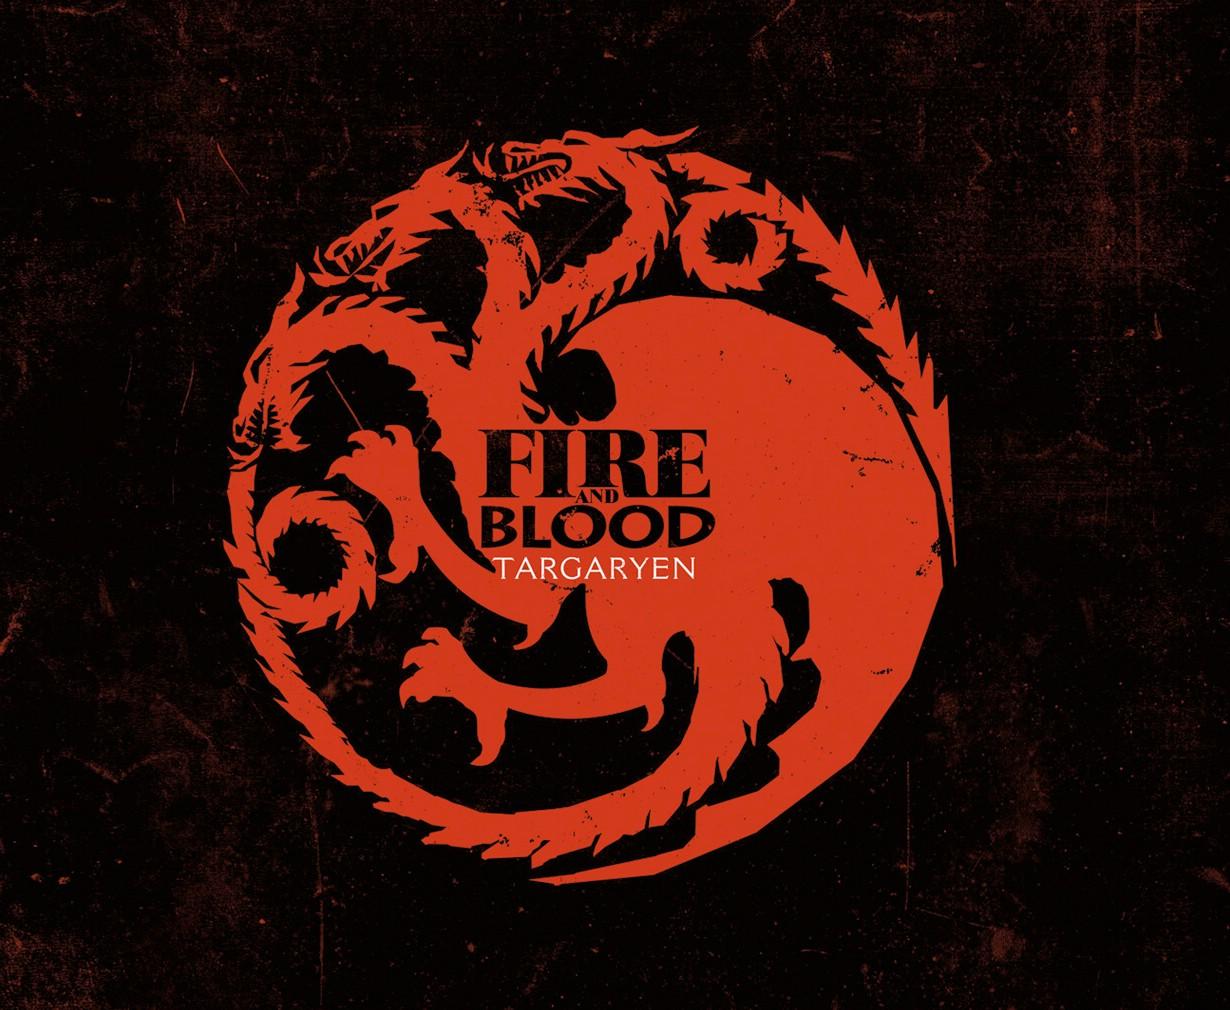 http://2.bp.blogspot.com/-Le9FtadMx50/T4Uc3StJ4TI/AAAAAAAAAJU/j9vSL1q0PFA/s1600/House-Targaryen-game-of-thrones-20596041-1600-1200.jpg